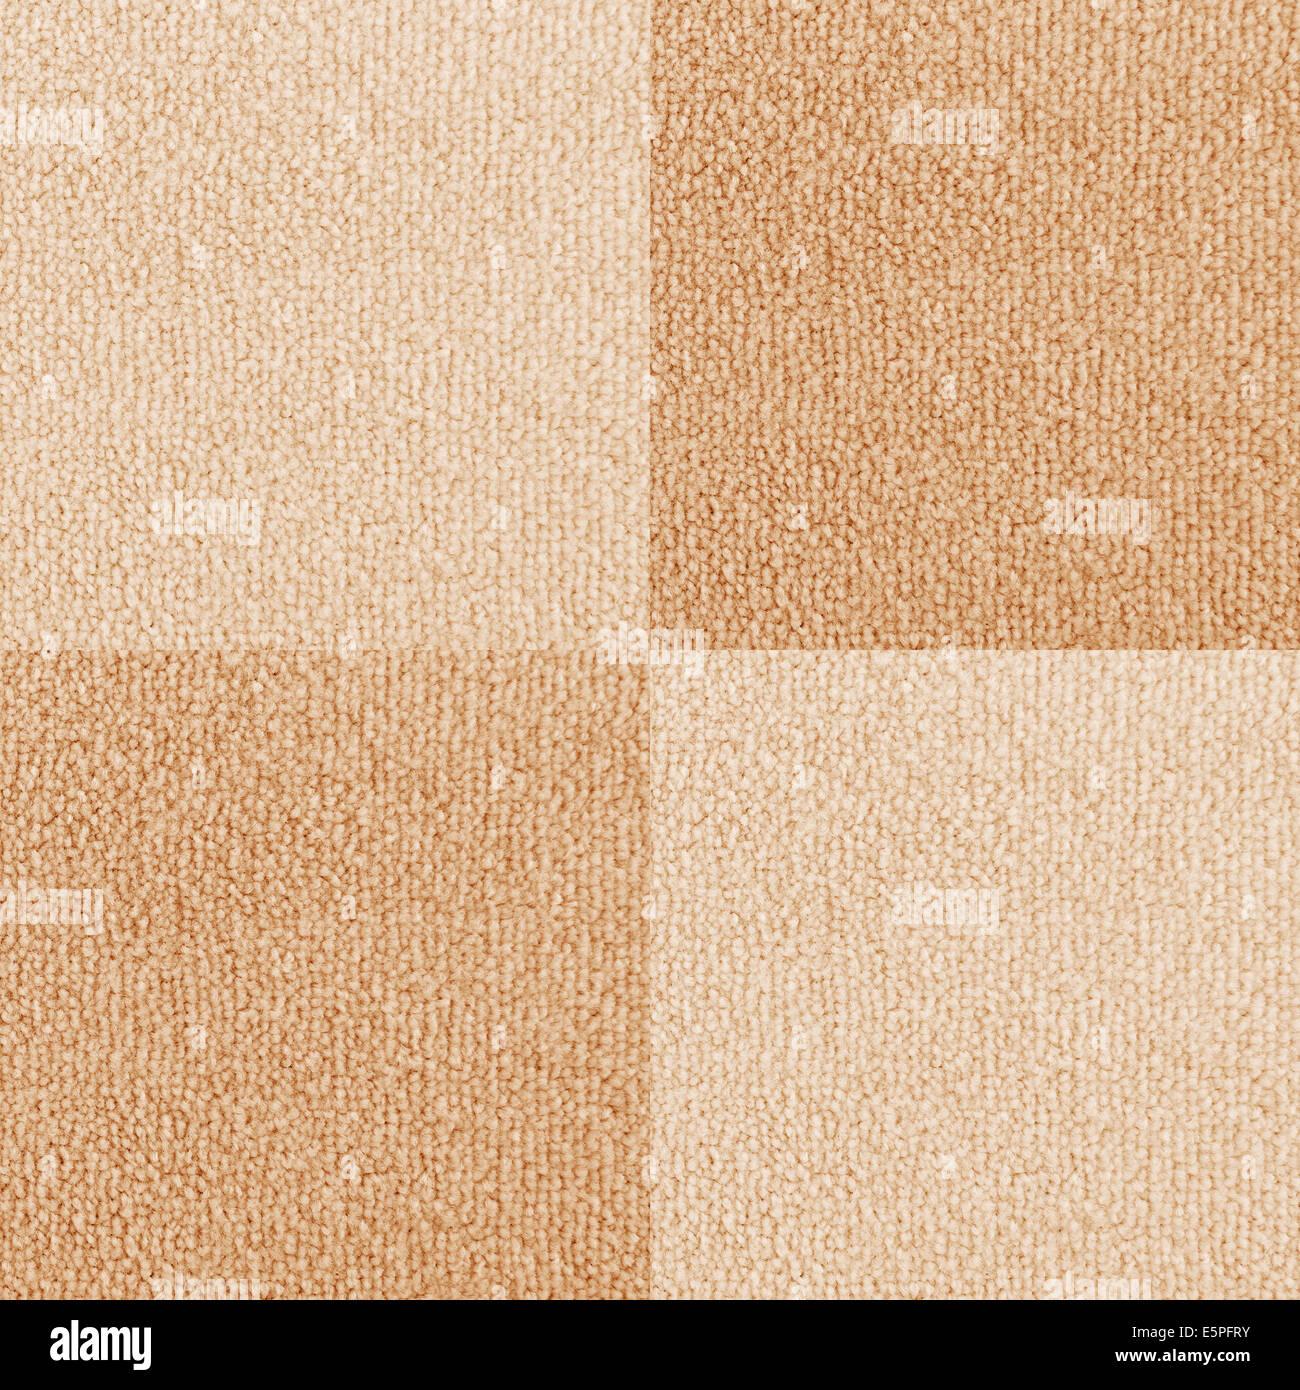 new checkered carpet texture bright beige carpet flooring as seamless background